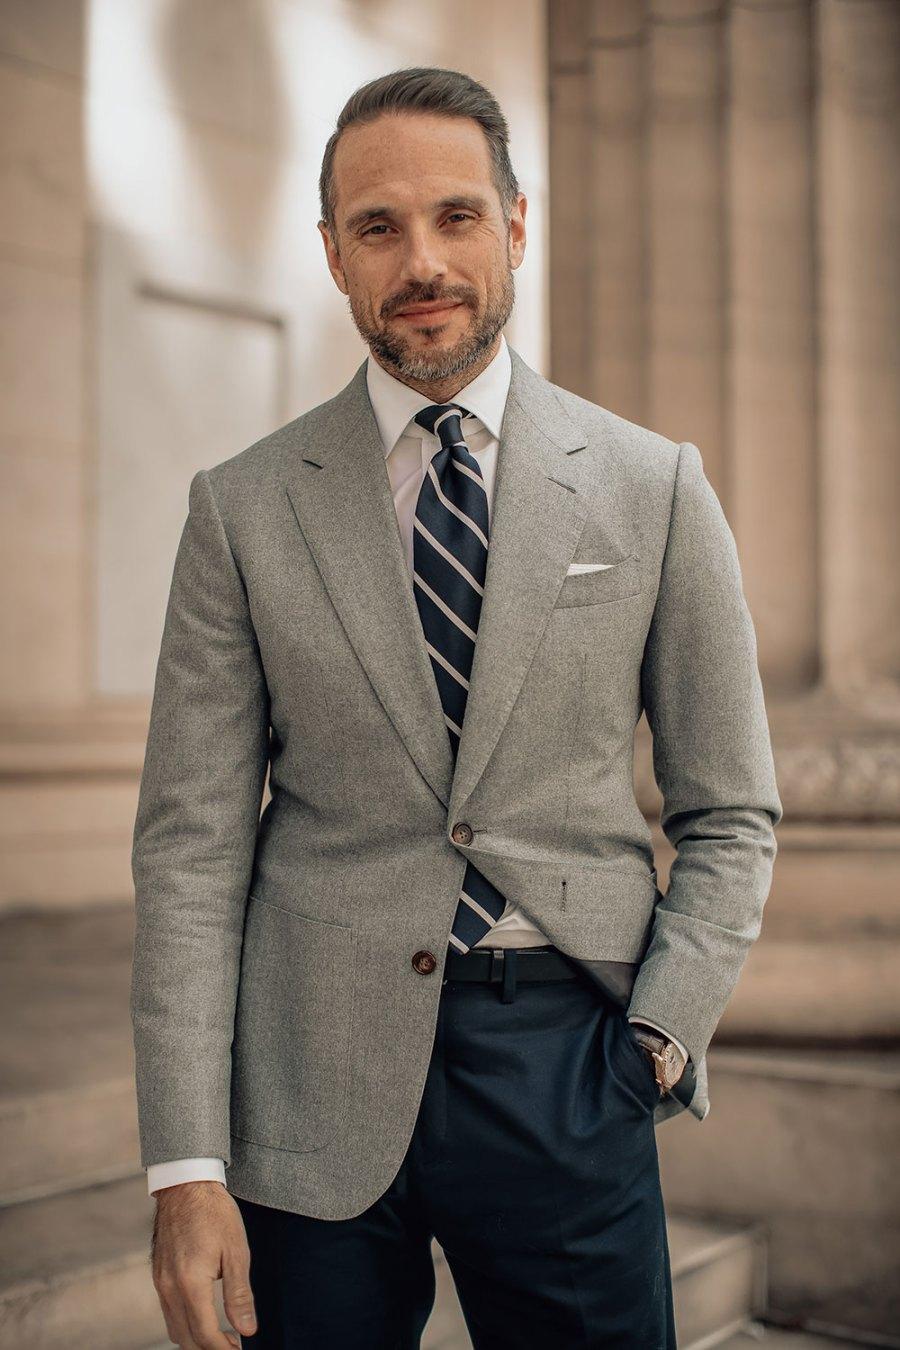 relaxed business attire men